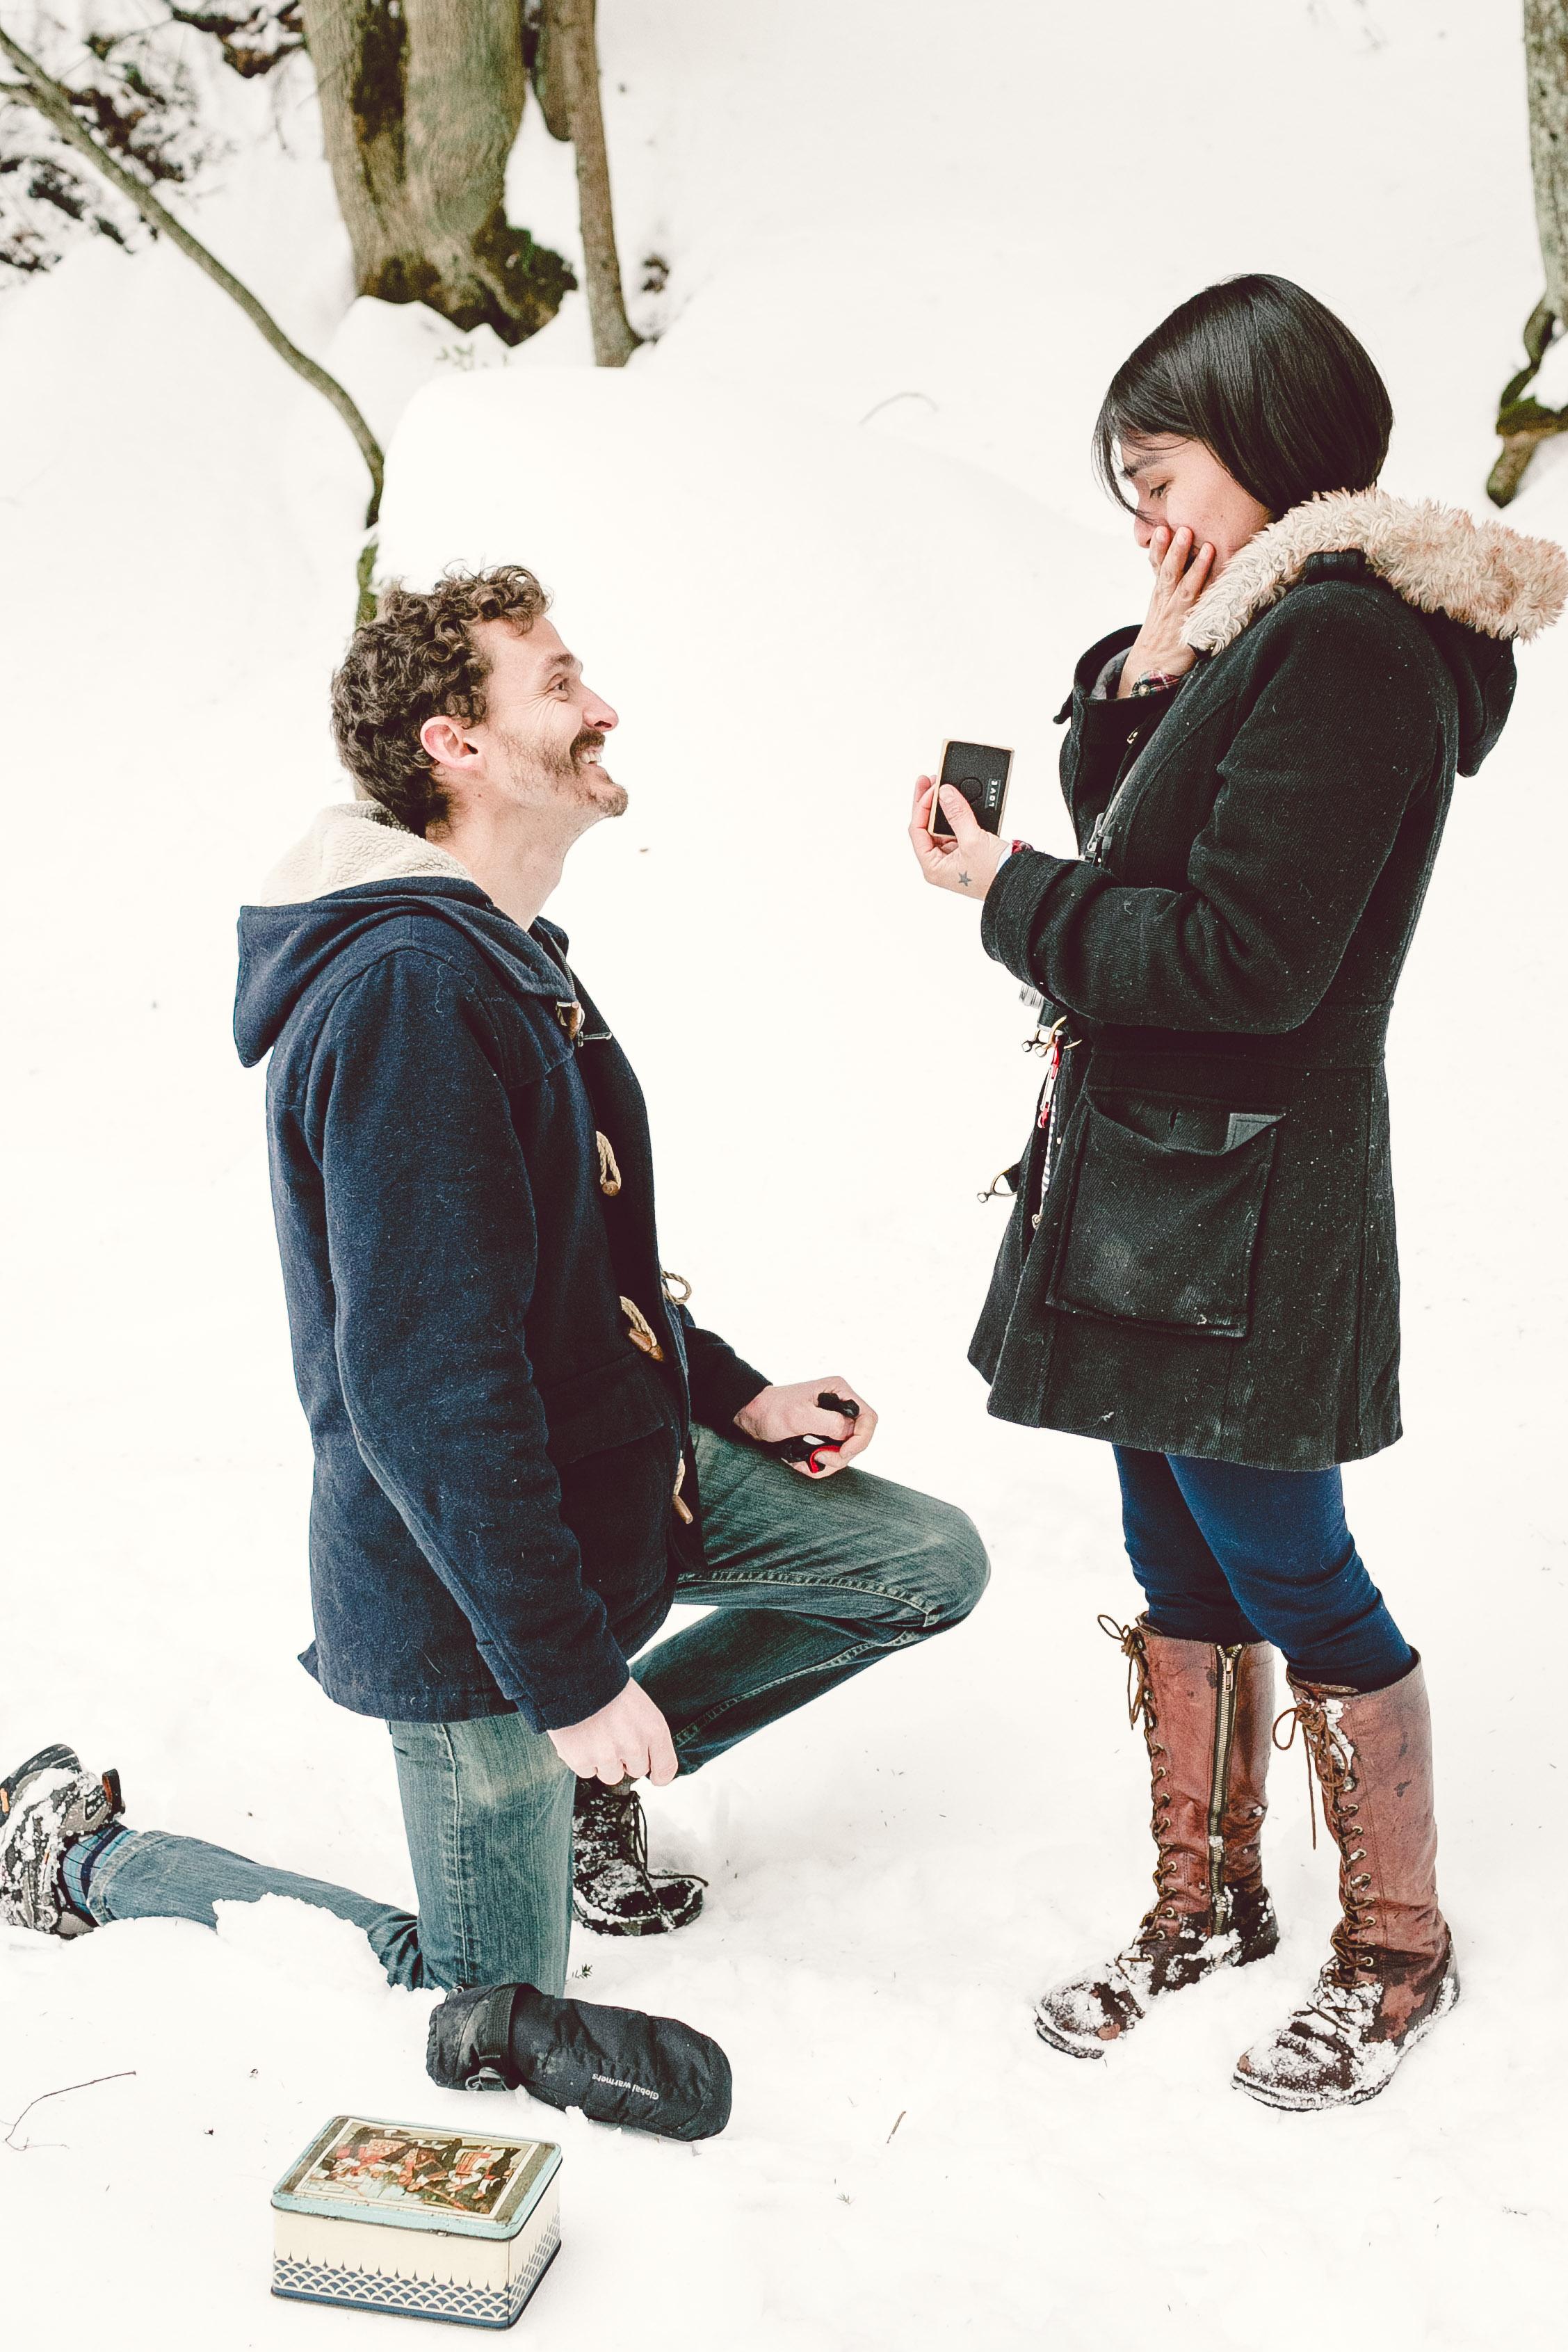 Surprise-Engagement-Photography-by-Jacek-Dolata-CT-MA-RI-NJ-NYC-NY-VT-NH-PA-2.jpg